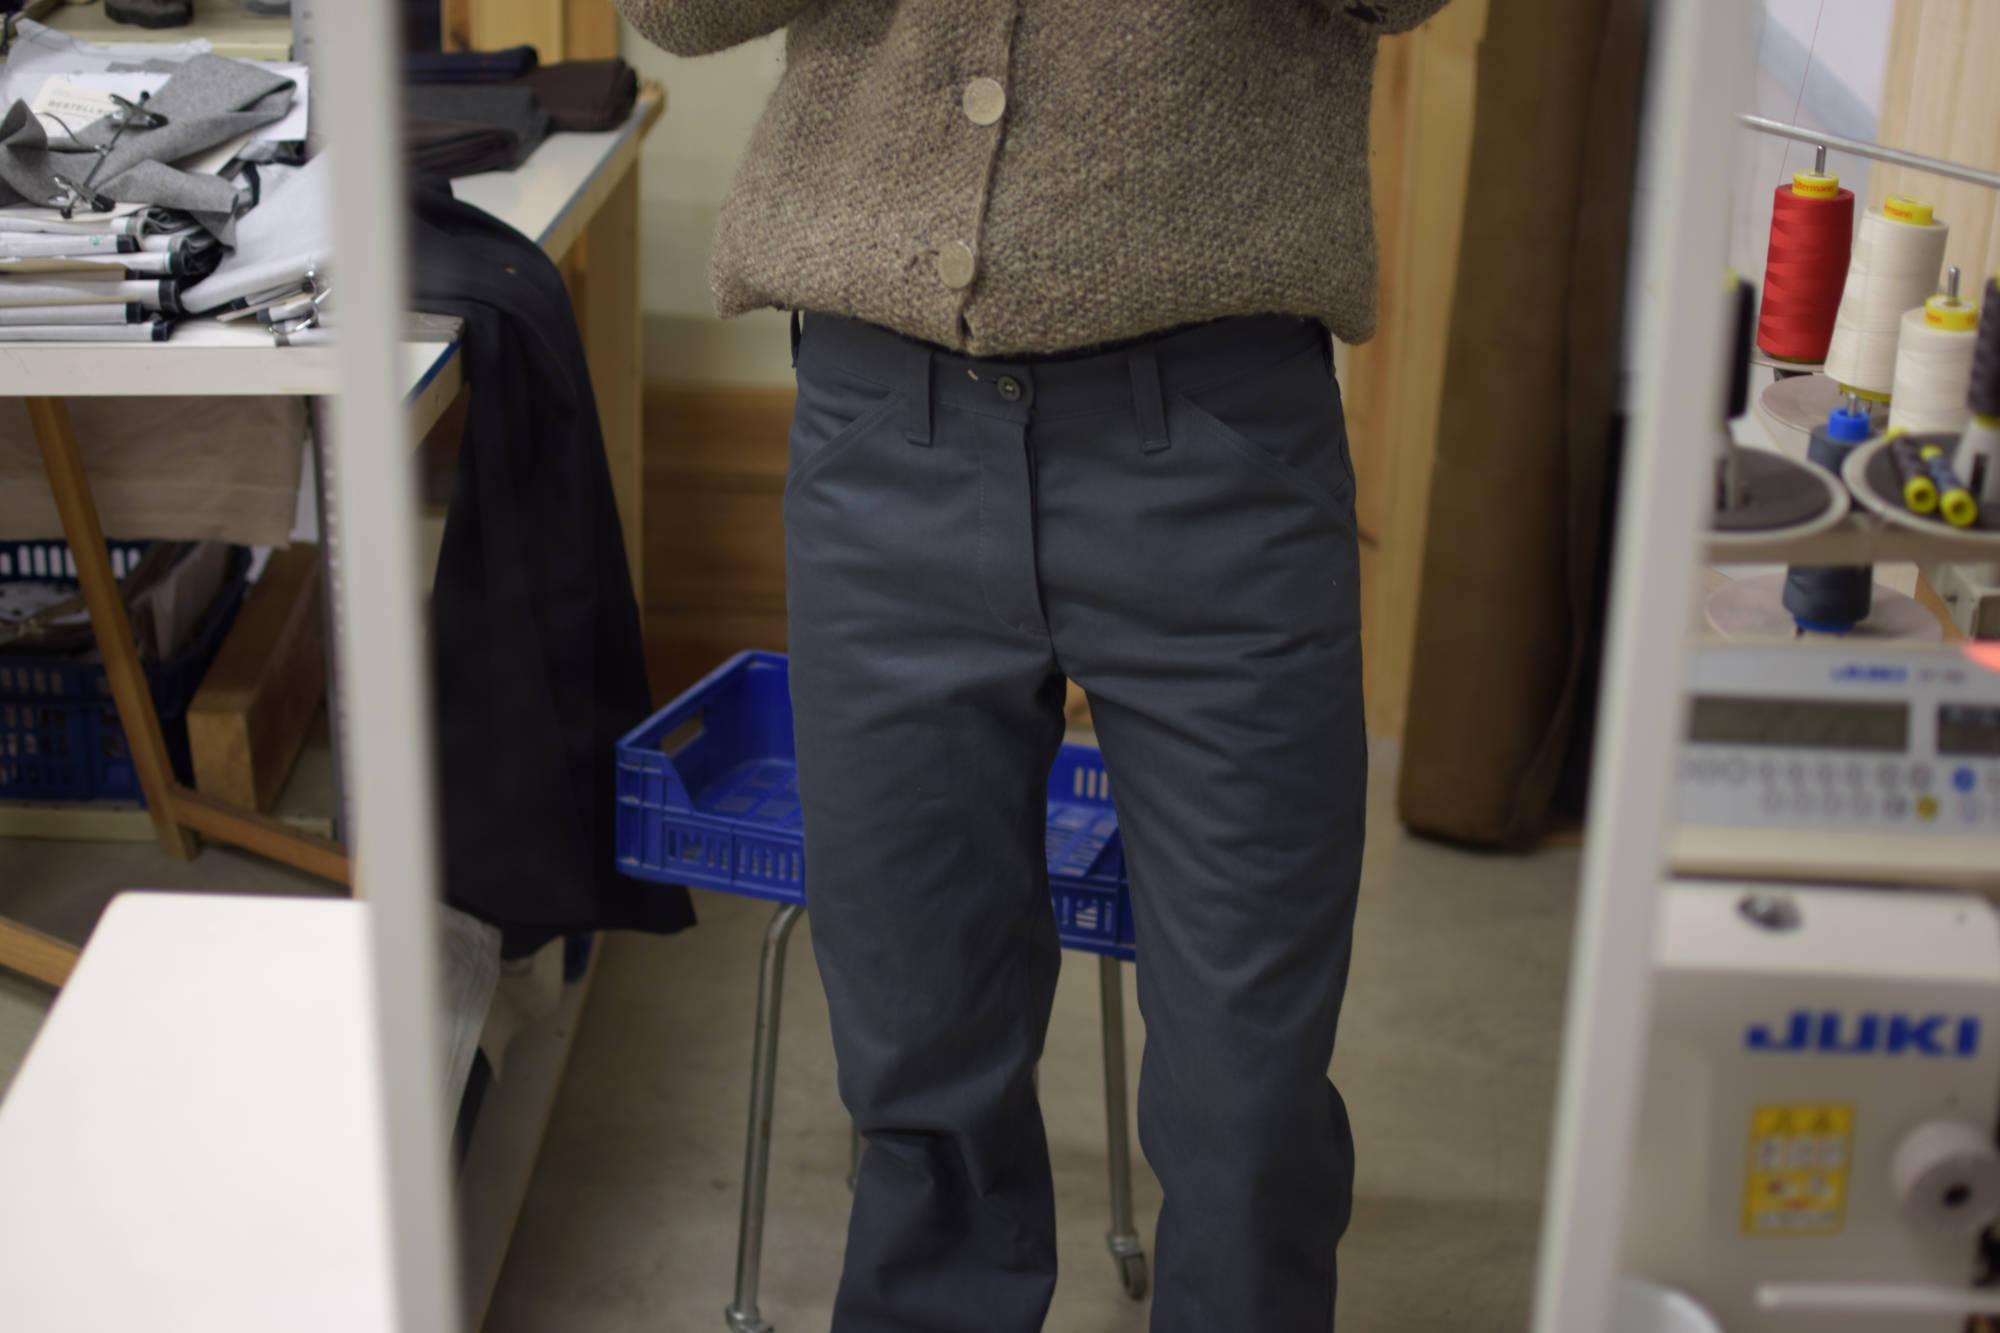 Robuste graue Hose in Ripsmoleskin aus Biobaumwolle